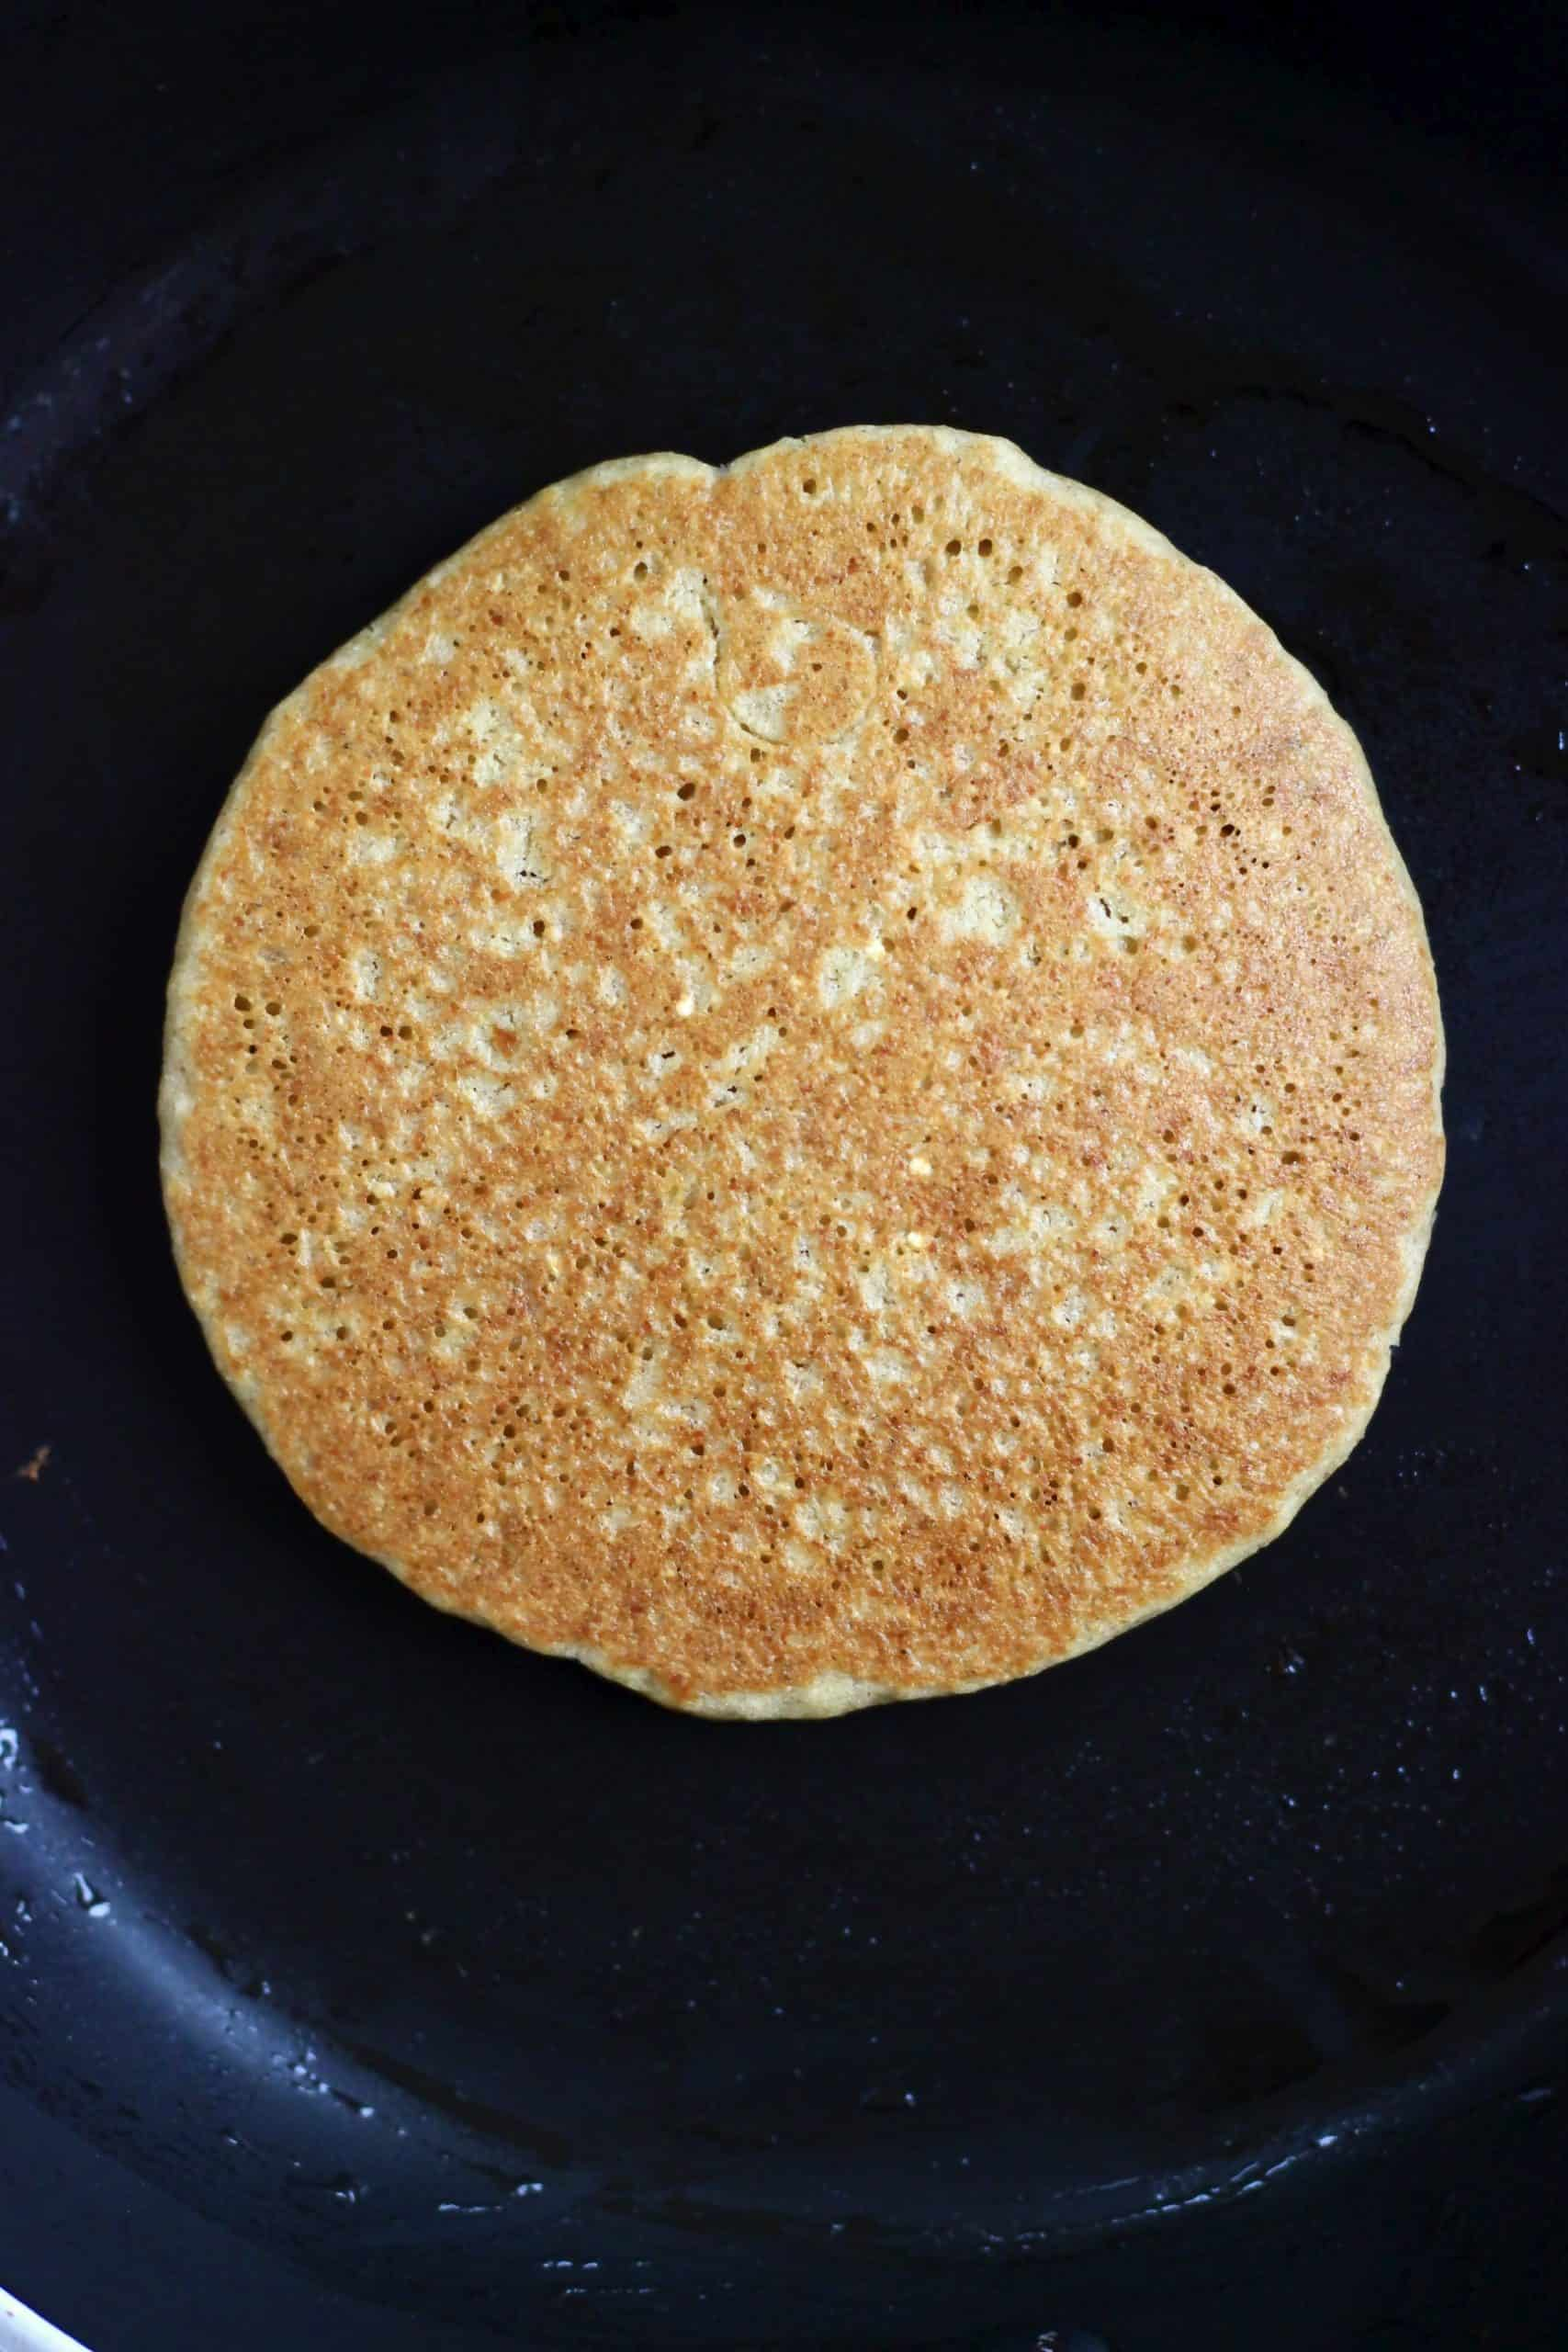 A golden brown quinoa pancake in a black frying pan